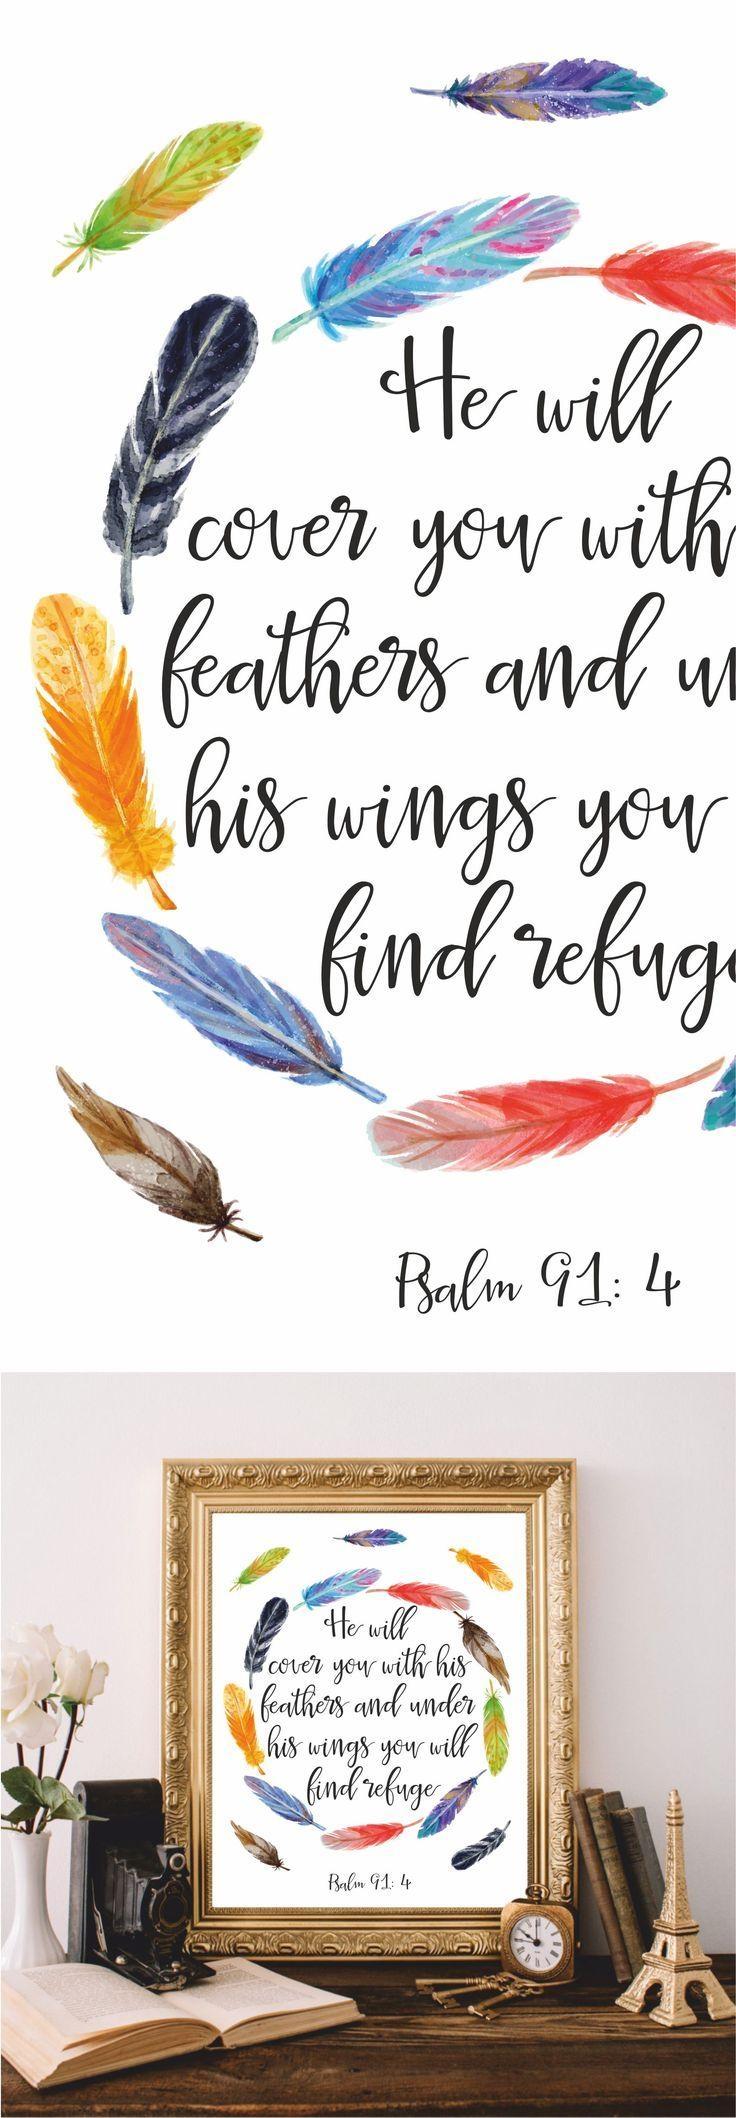 Best 25+ Scripture Wall Art Ideas On Pinterest | Christian Art Pertaining To Bible Verses Framed Art (Image 6 of 20)